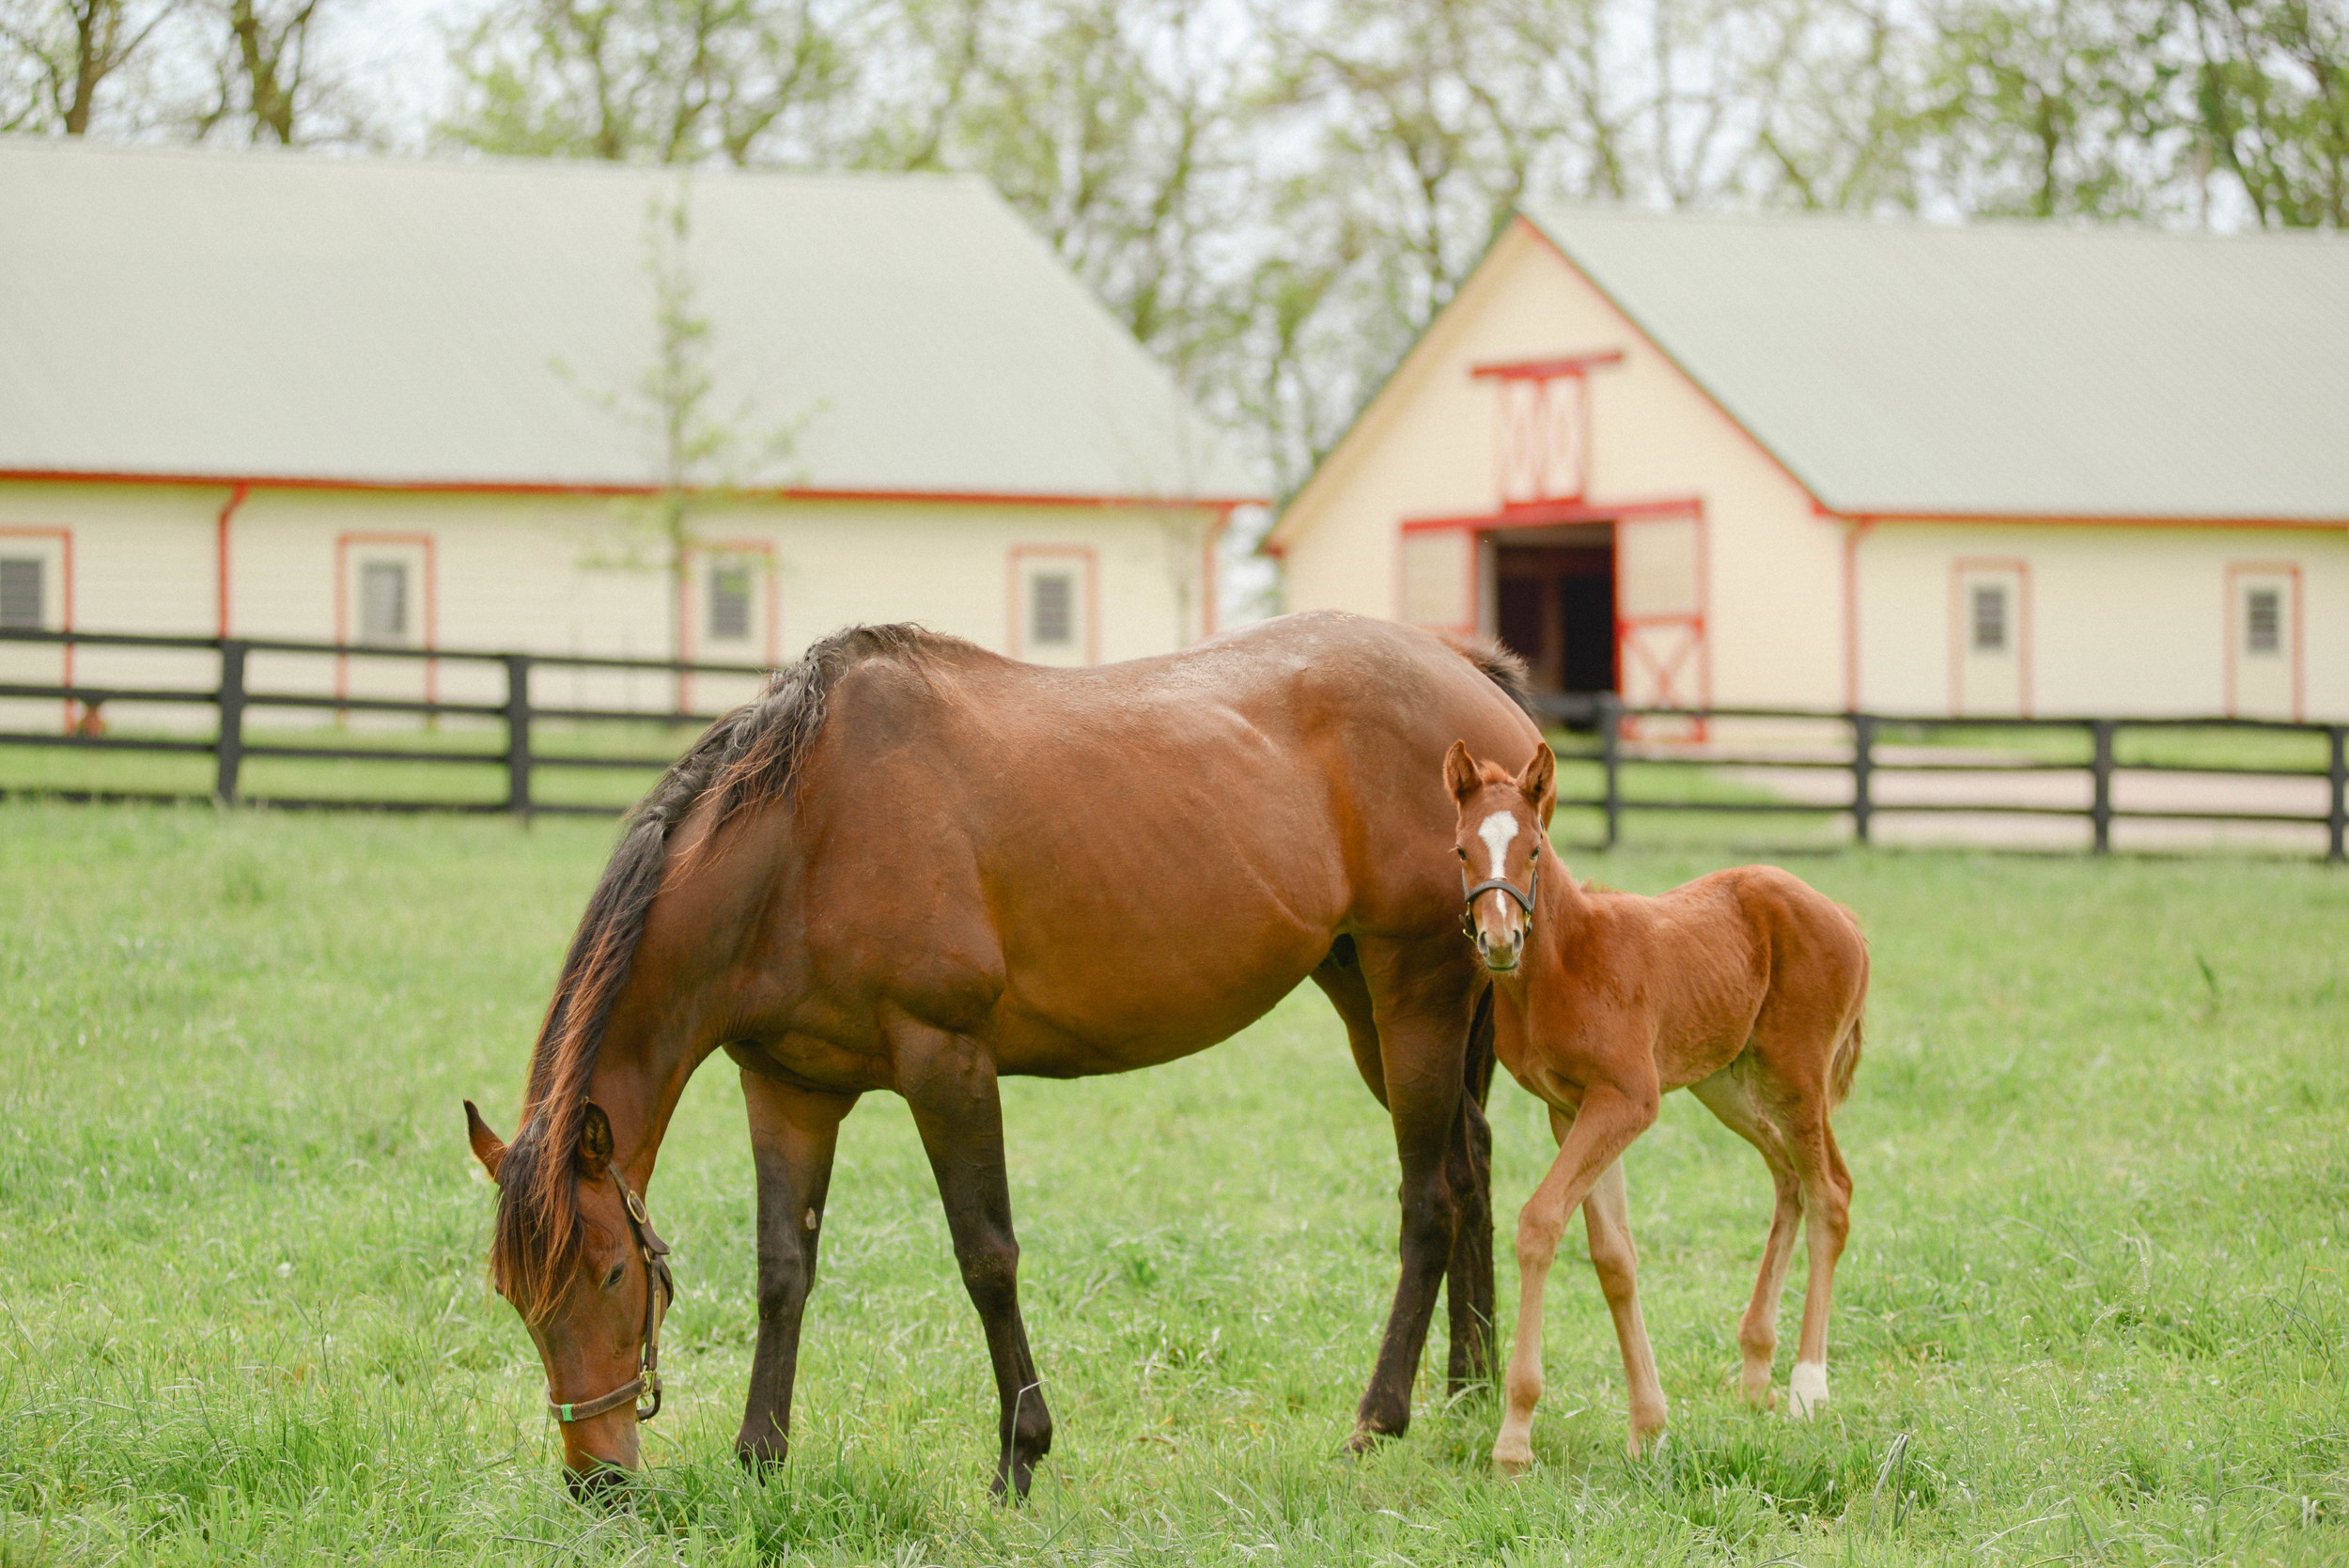 Kentucky Derby photography